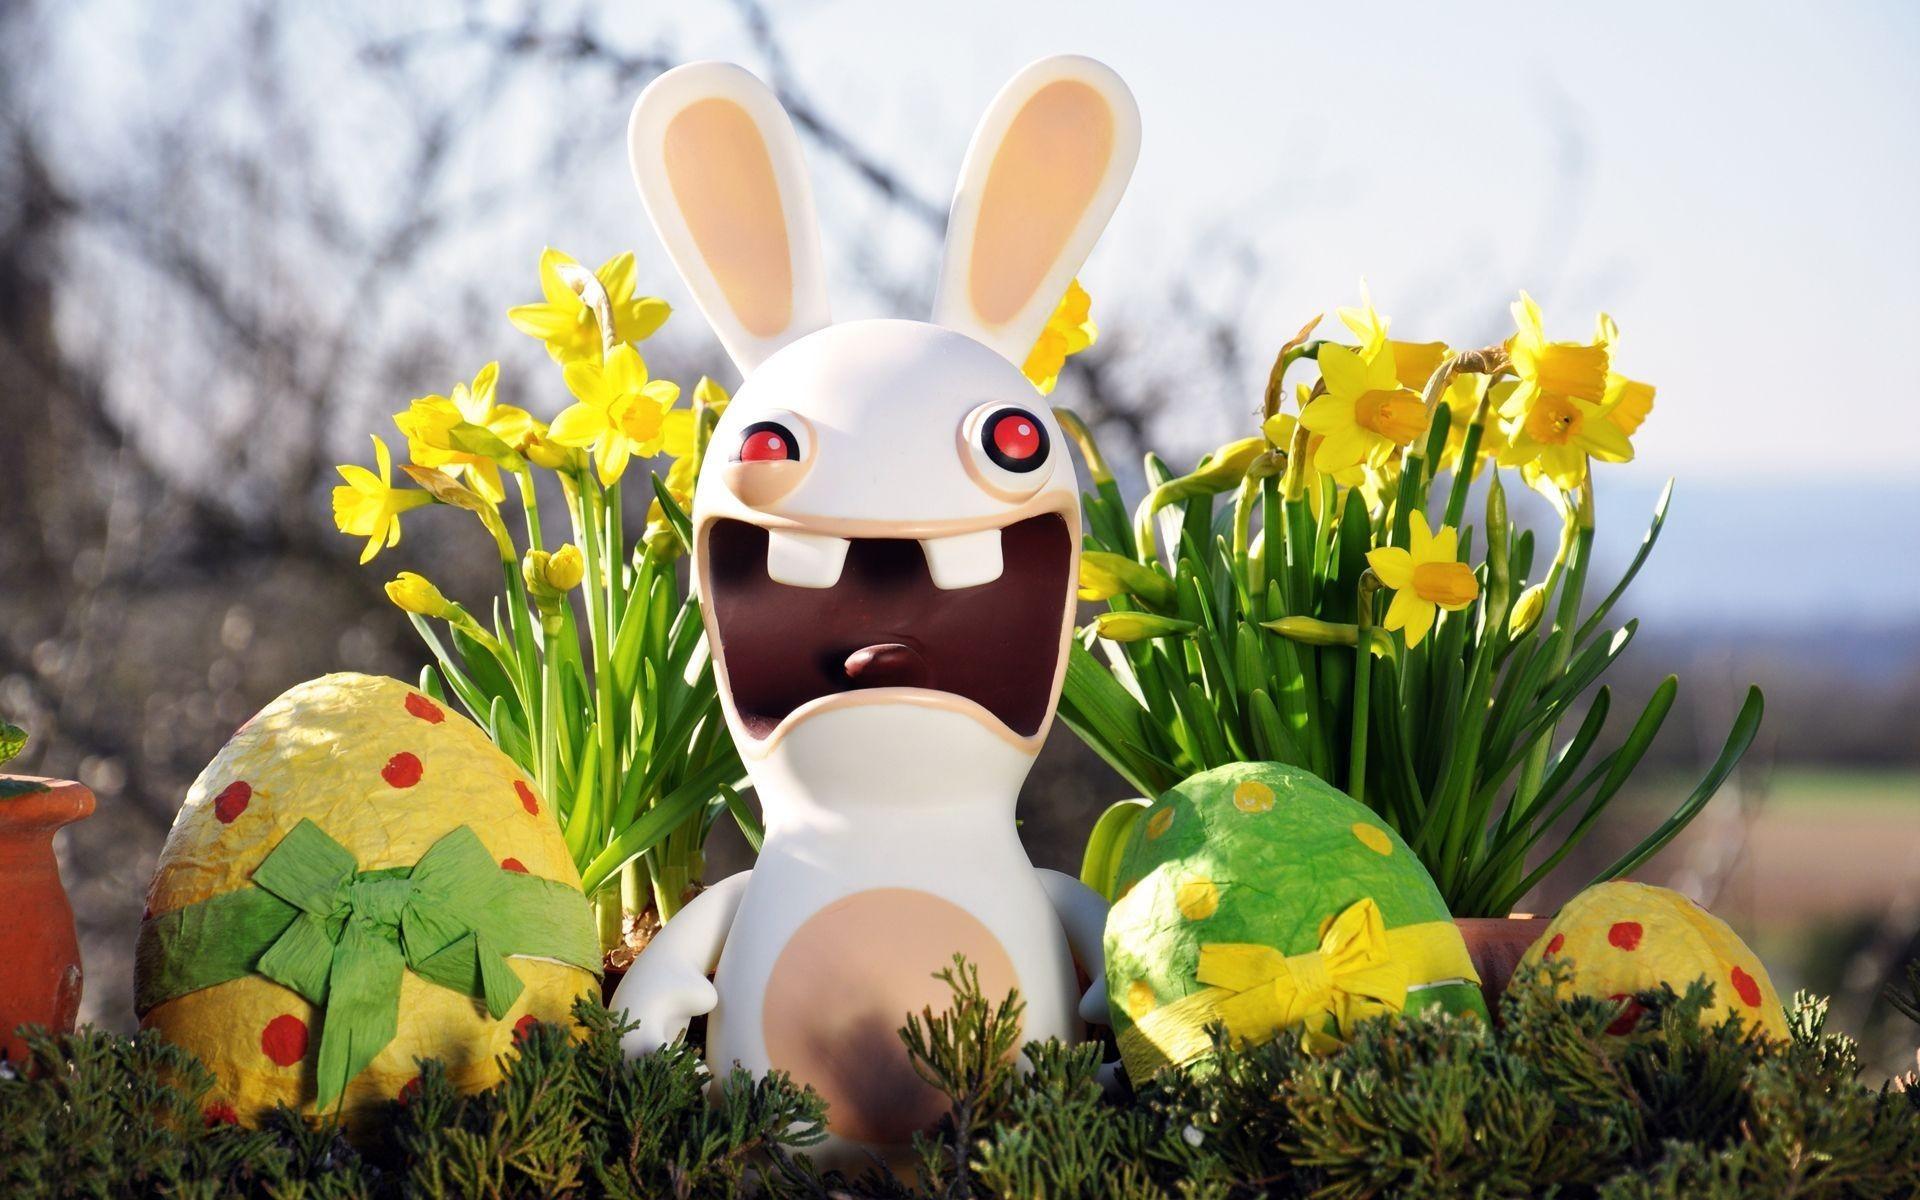 Easter wallpapers for desktop 64 images - Easter bunny wallpaper ...